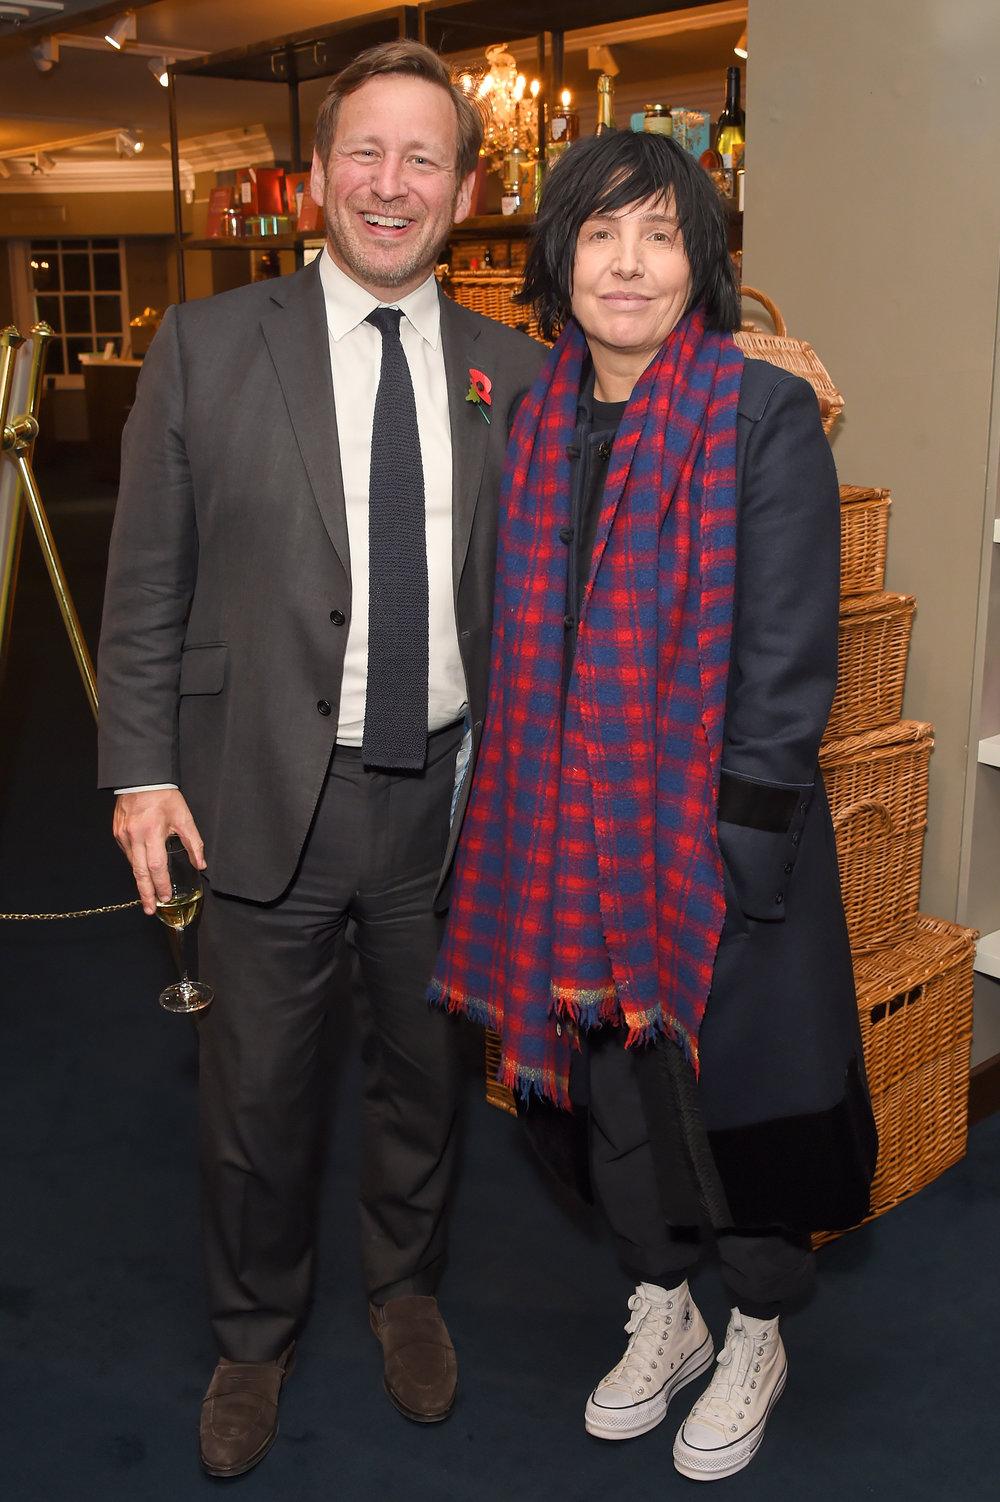 Rt Hon Ed Vaizey MP and Sharleen Spiteri. Courtesy Dave Benett.